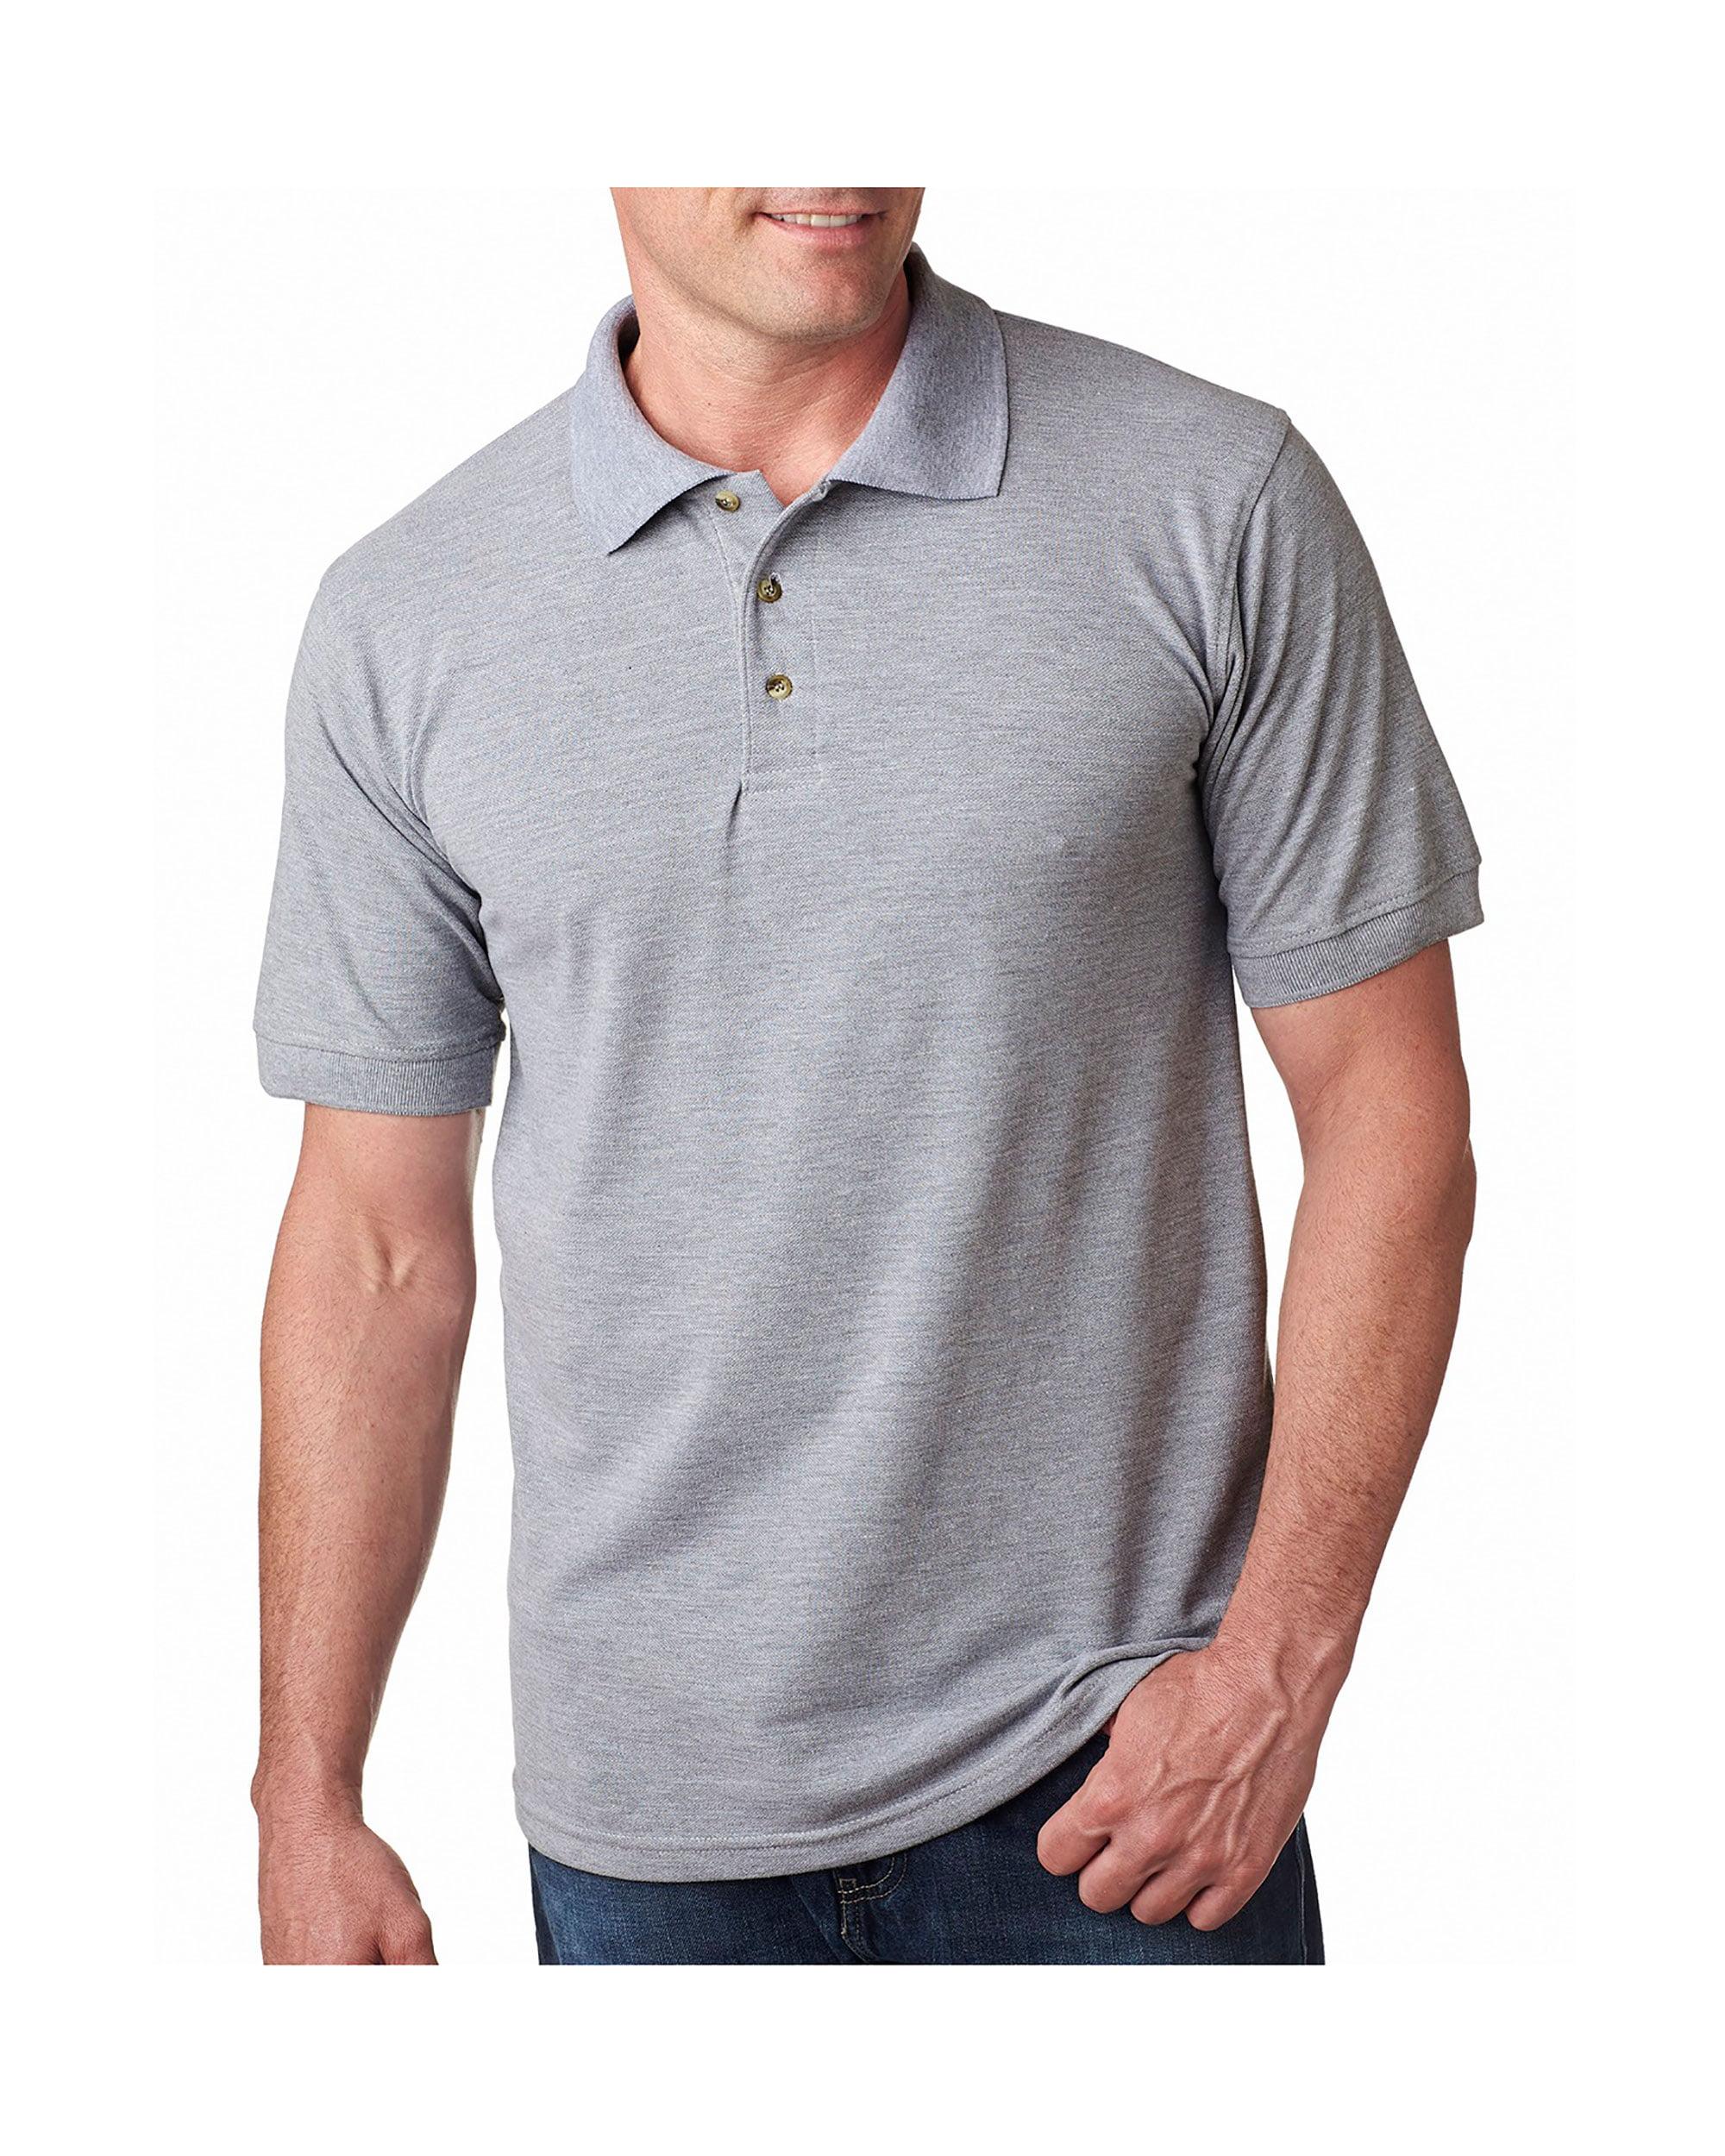 Bayside Adult Preshrunk American Style Pique Polo Shirt